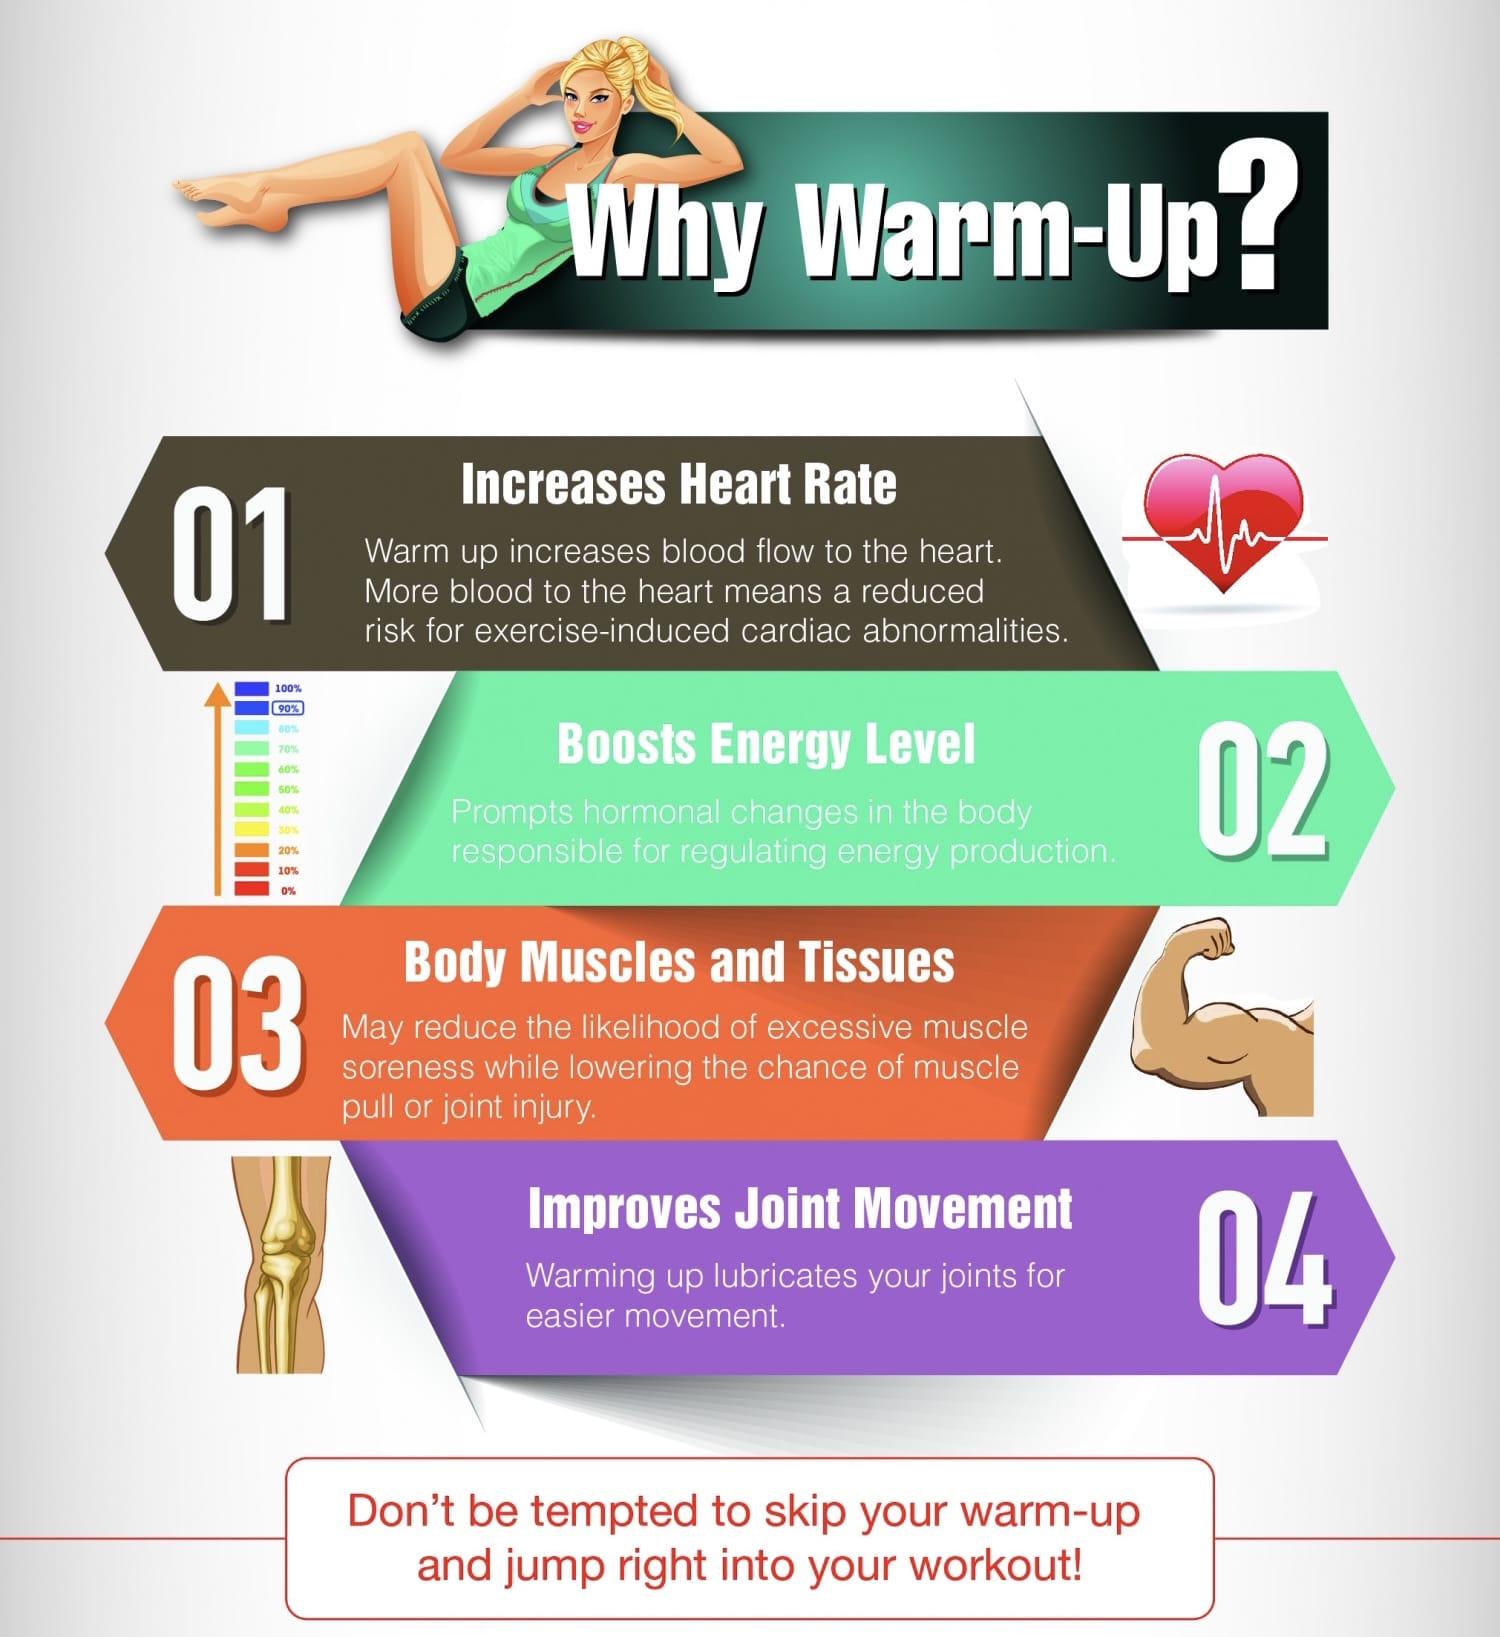 Never skip warm up